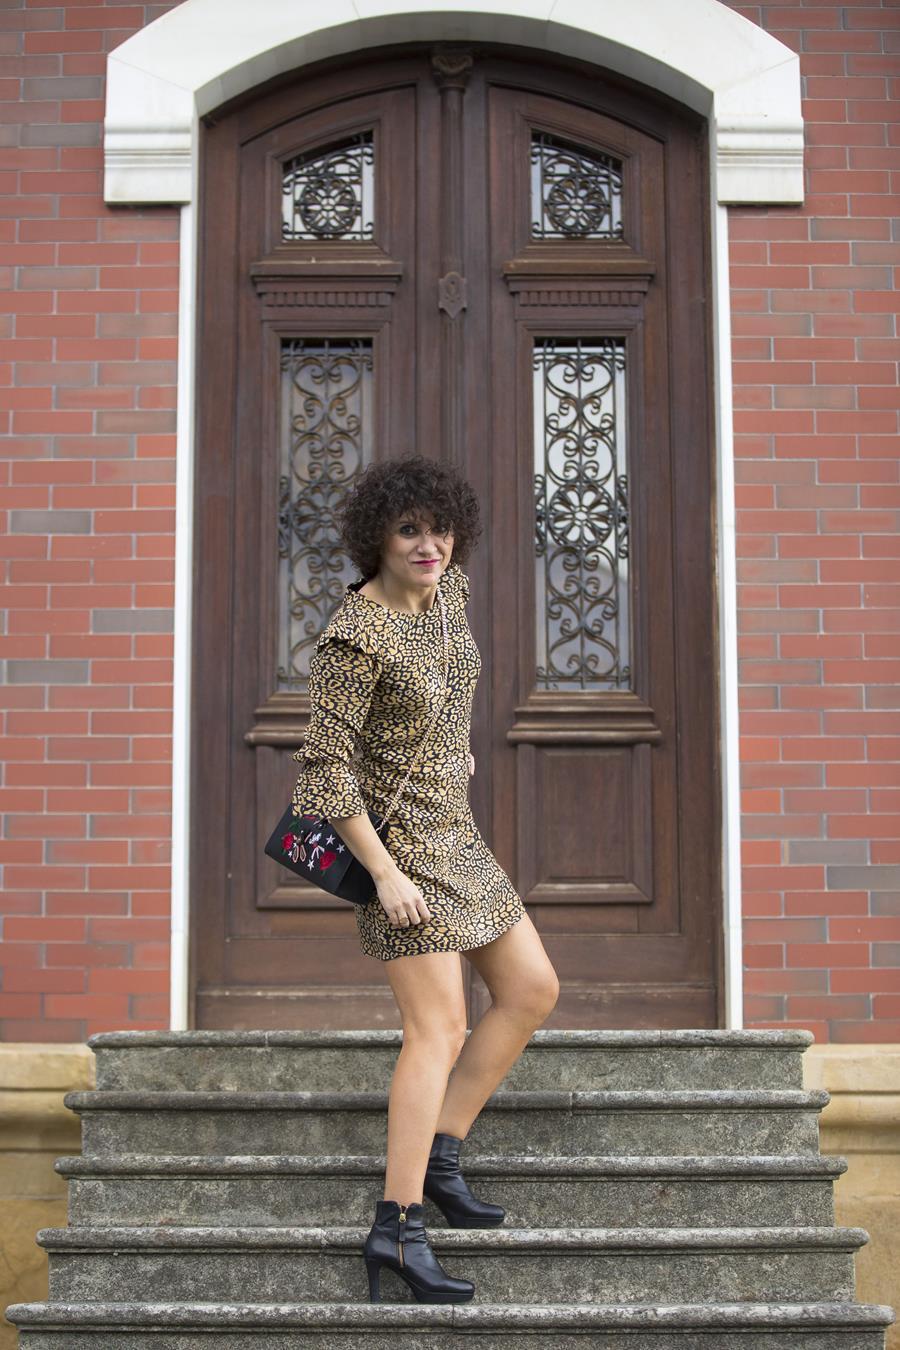 Rebeca Valdivia, Miss Clov, Personal Shopper, Donostia, Getaria, animalprint, leopardo, dress, vestido, botines tacon, plataforma, boots, bag, bolso bandolera parches